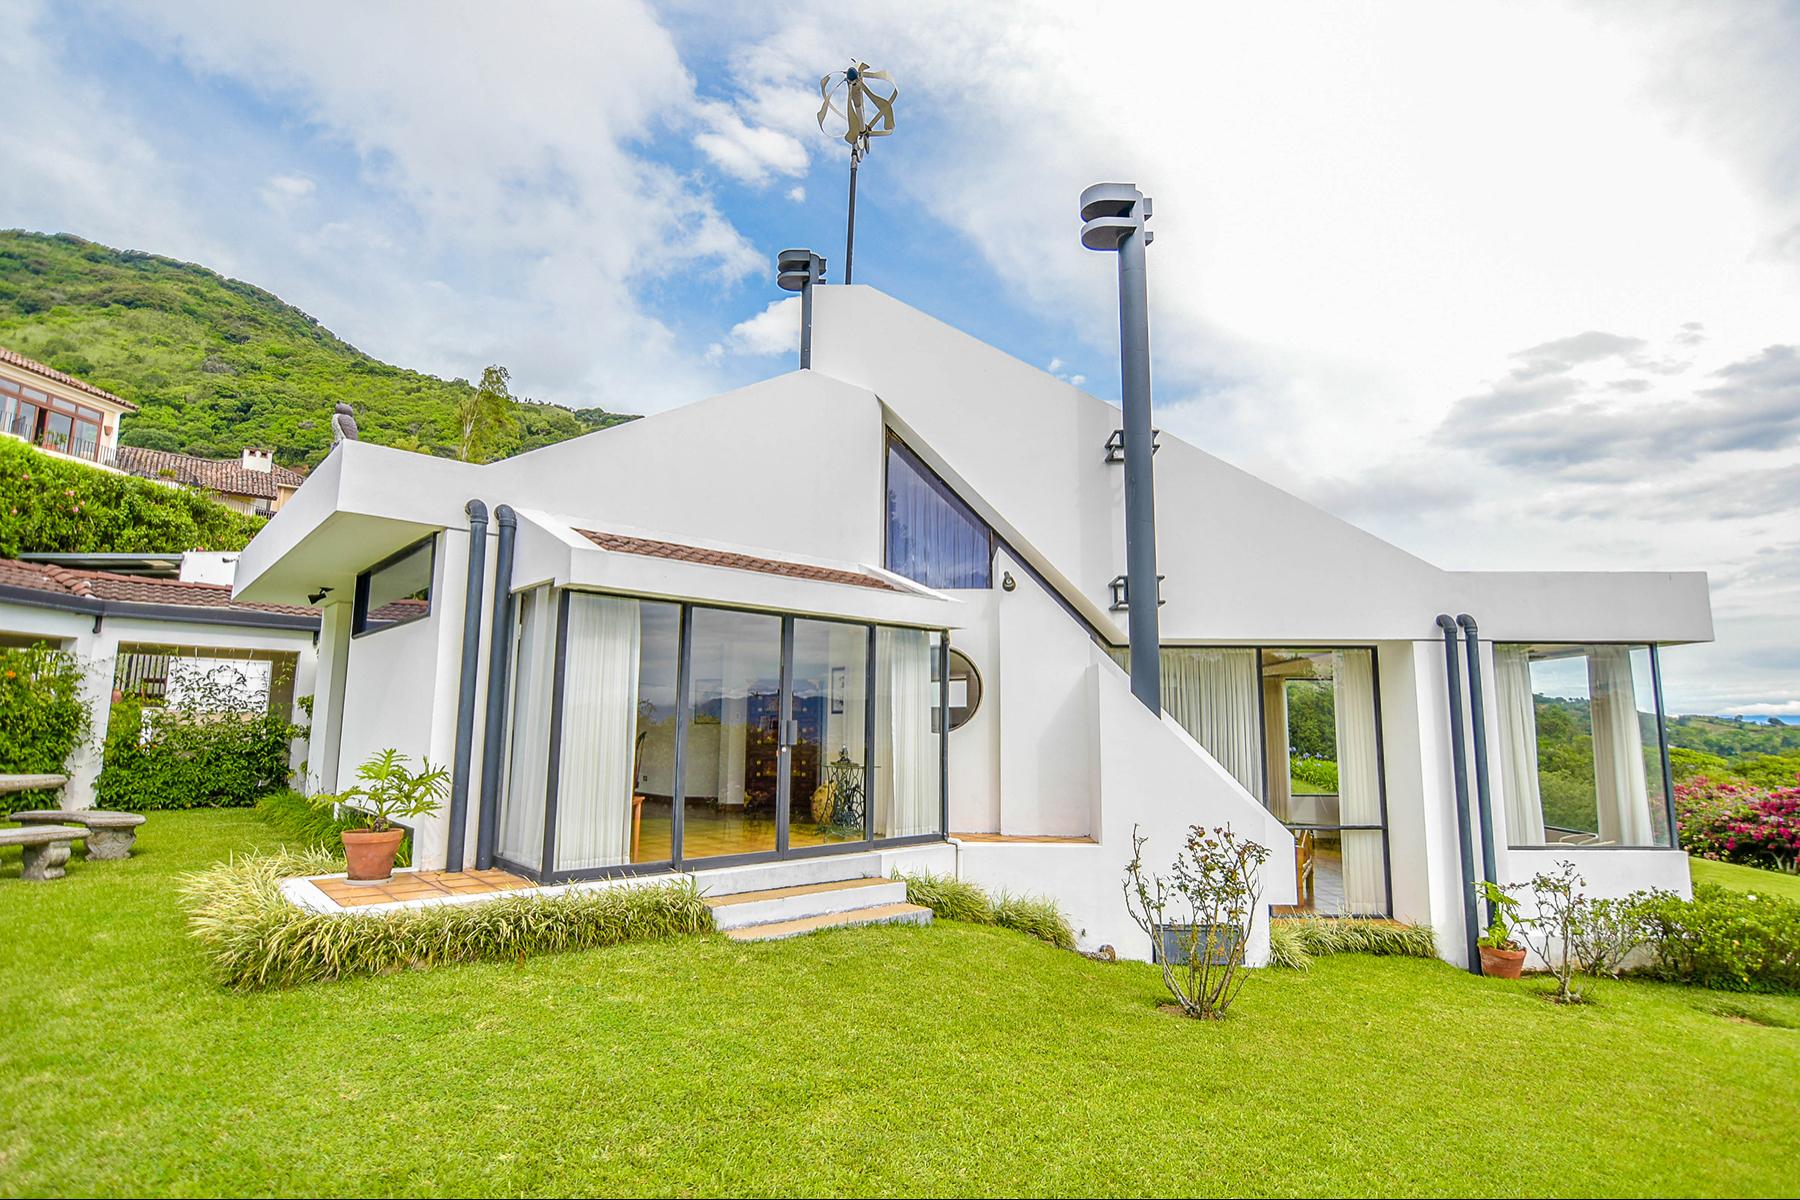 Single Family Homes for Sale at Escazú Mountain Retreat Escazu, San Jose Costa Rica